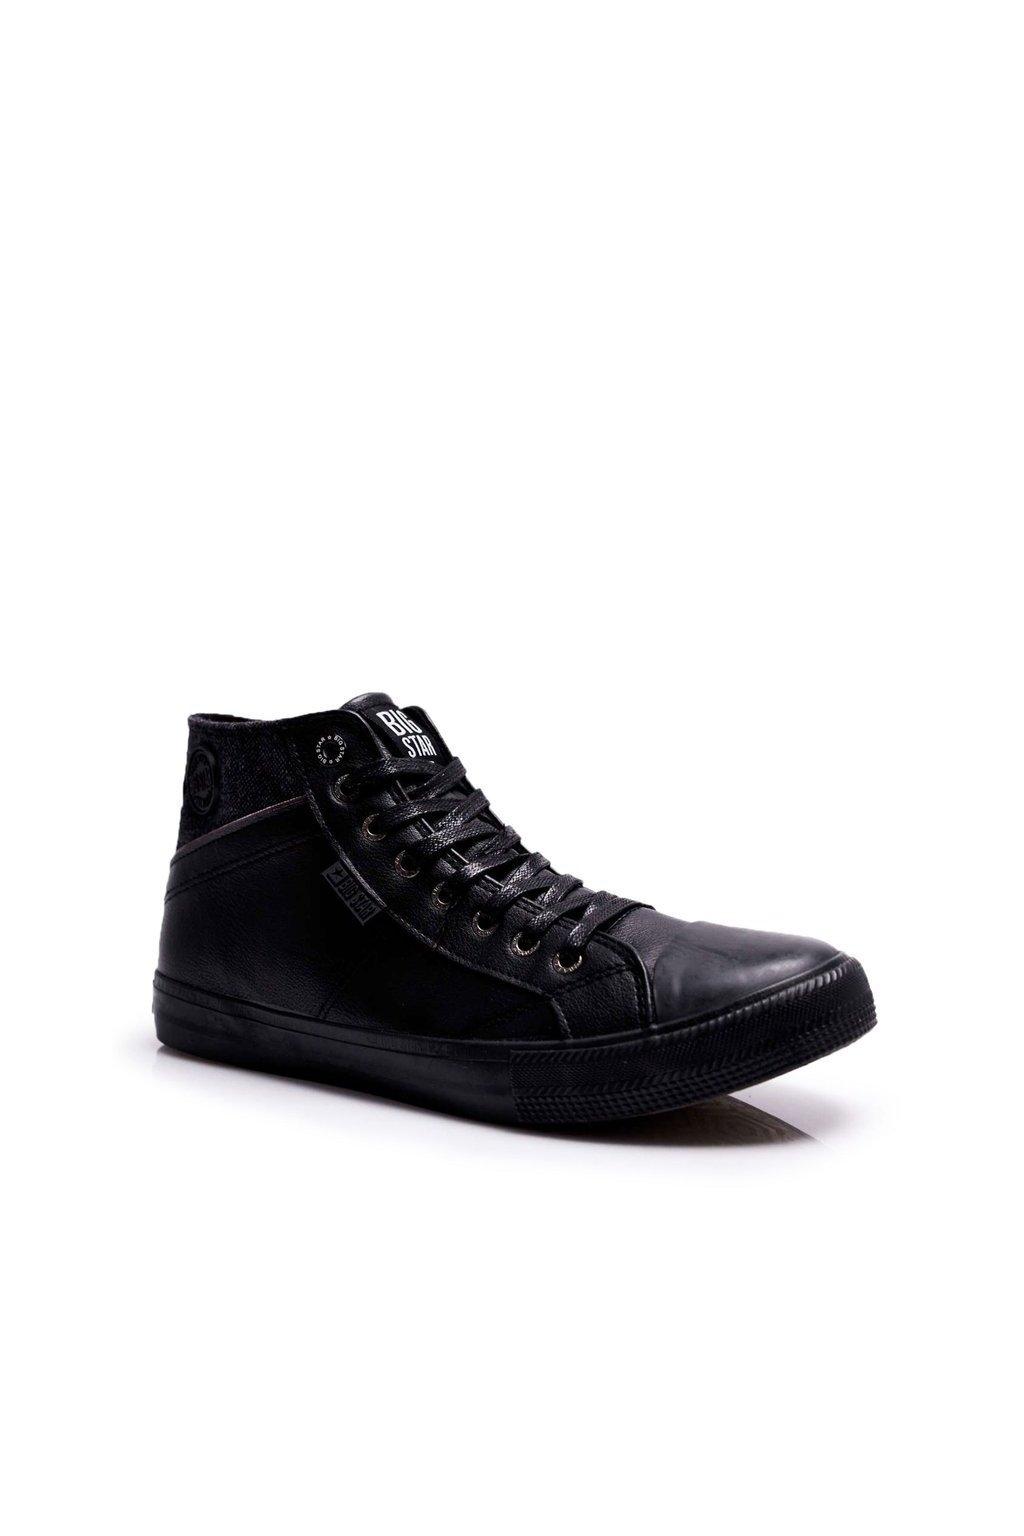 Čierna obuv kód topánok EE174102 BLK